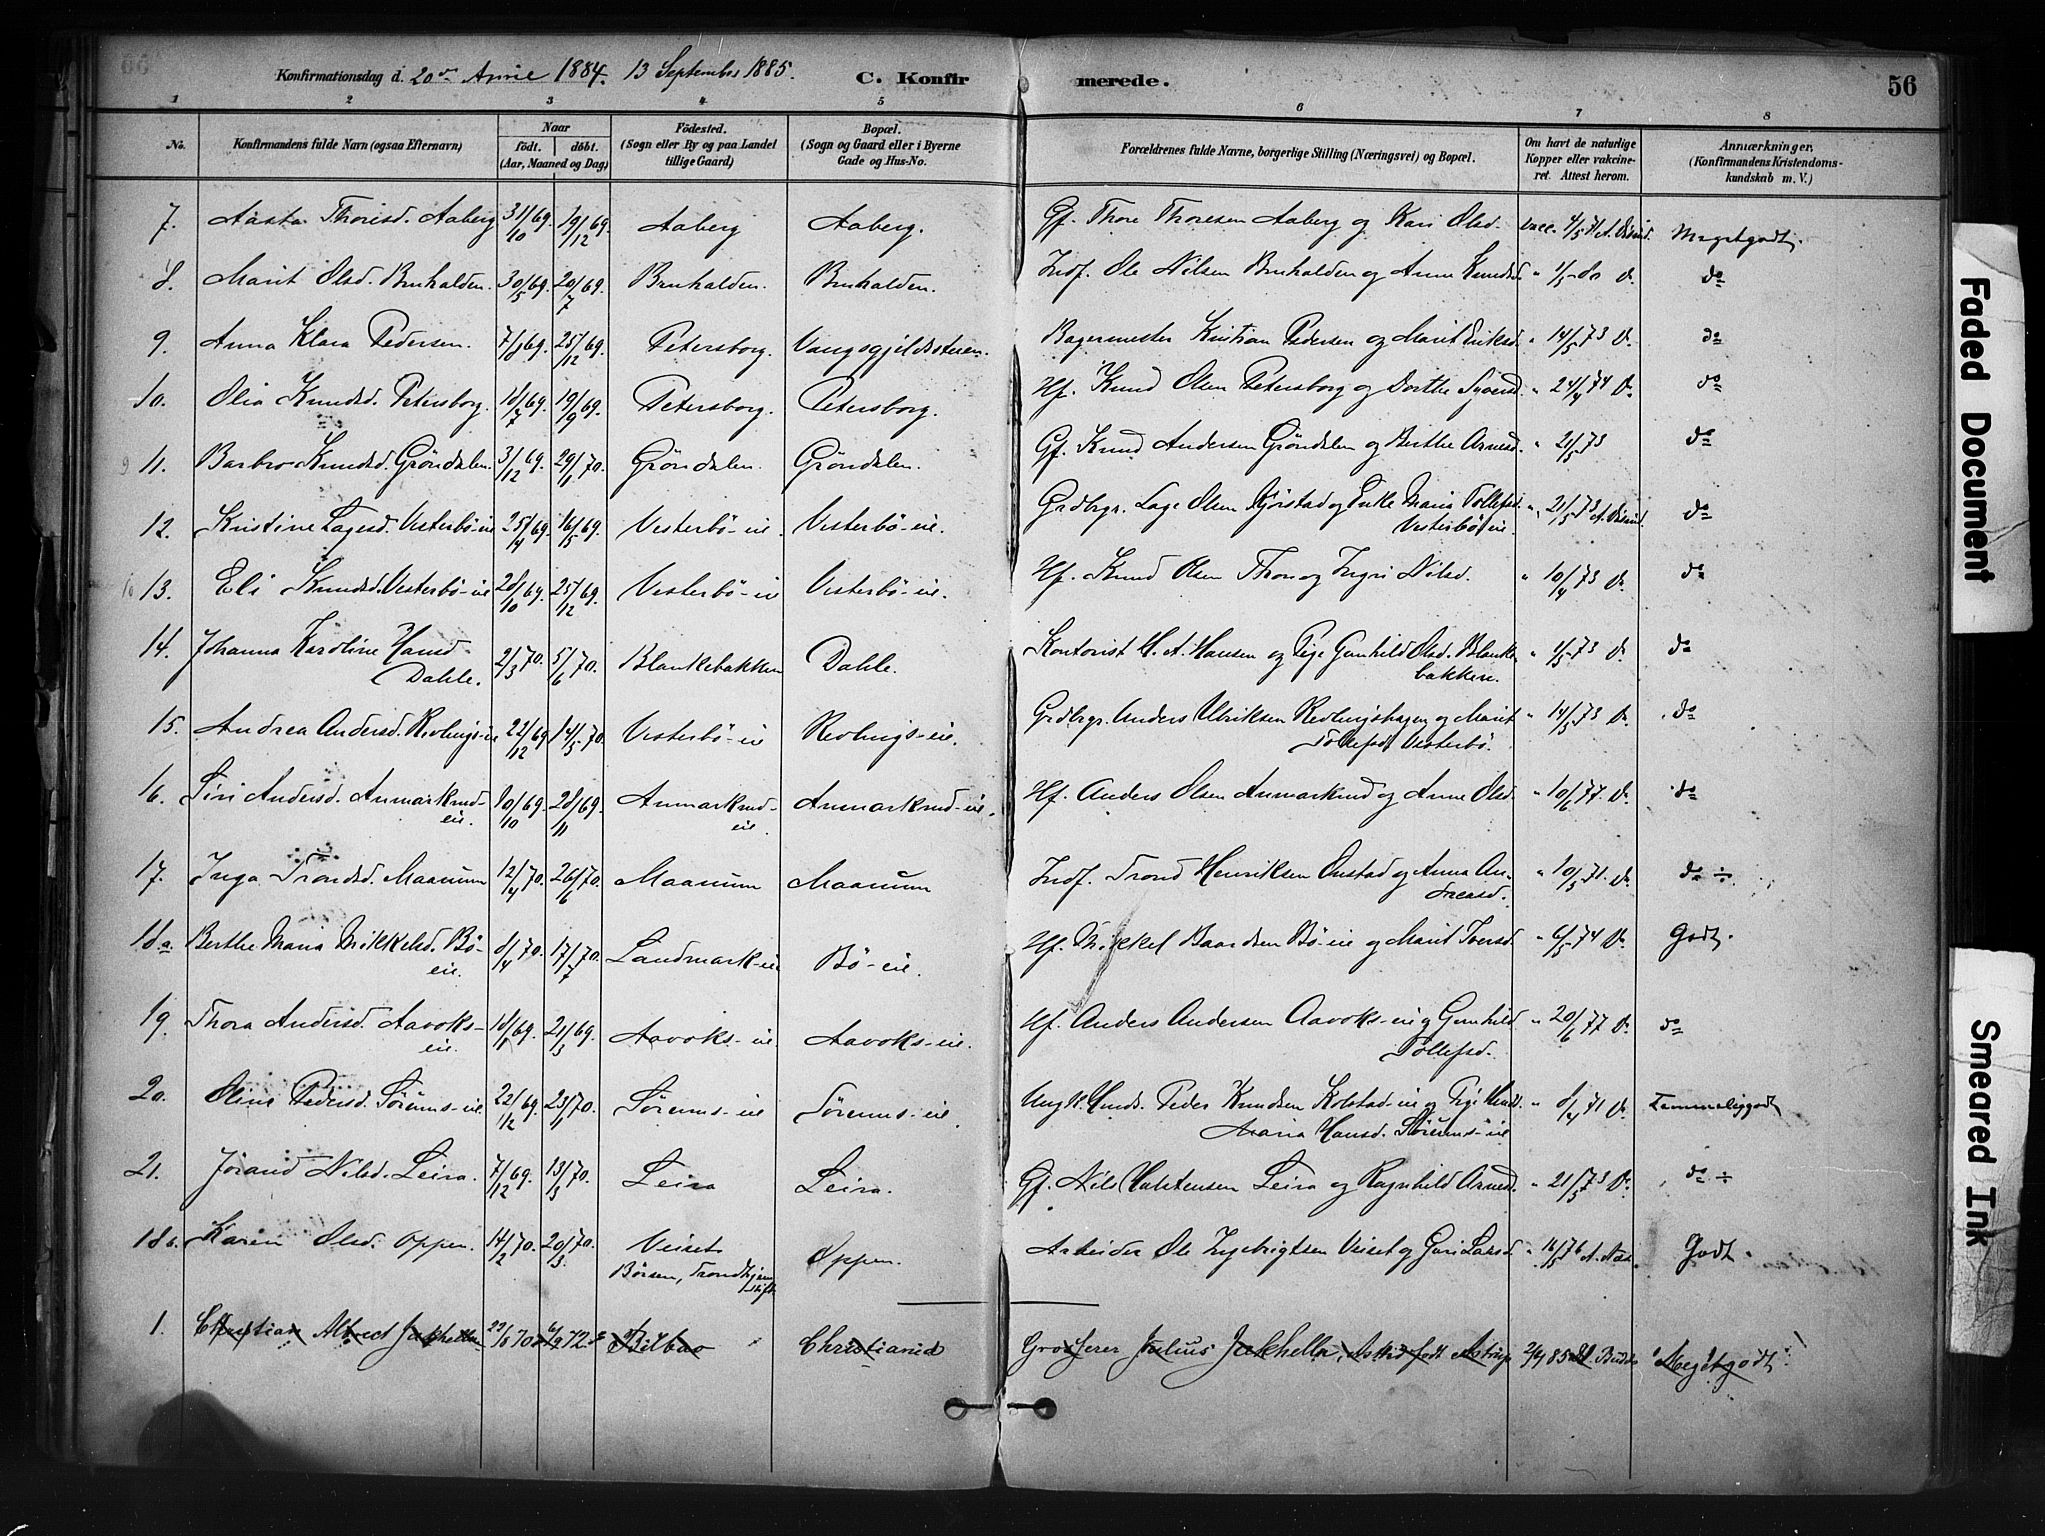 SAH, Nord-Aurdal prestekontor, Ministerialbok nr. 13, 1883-1895, s. 56